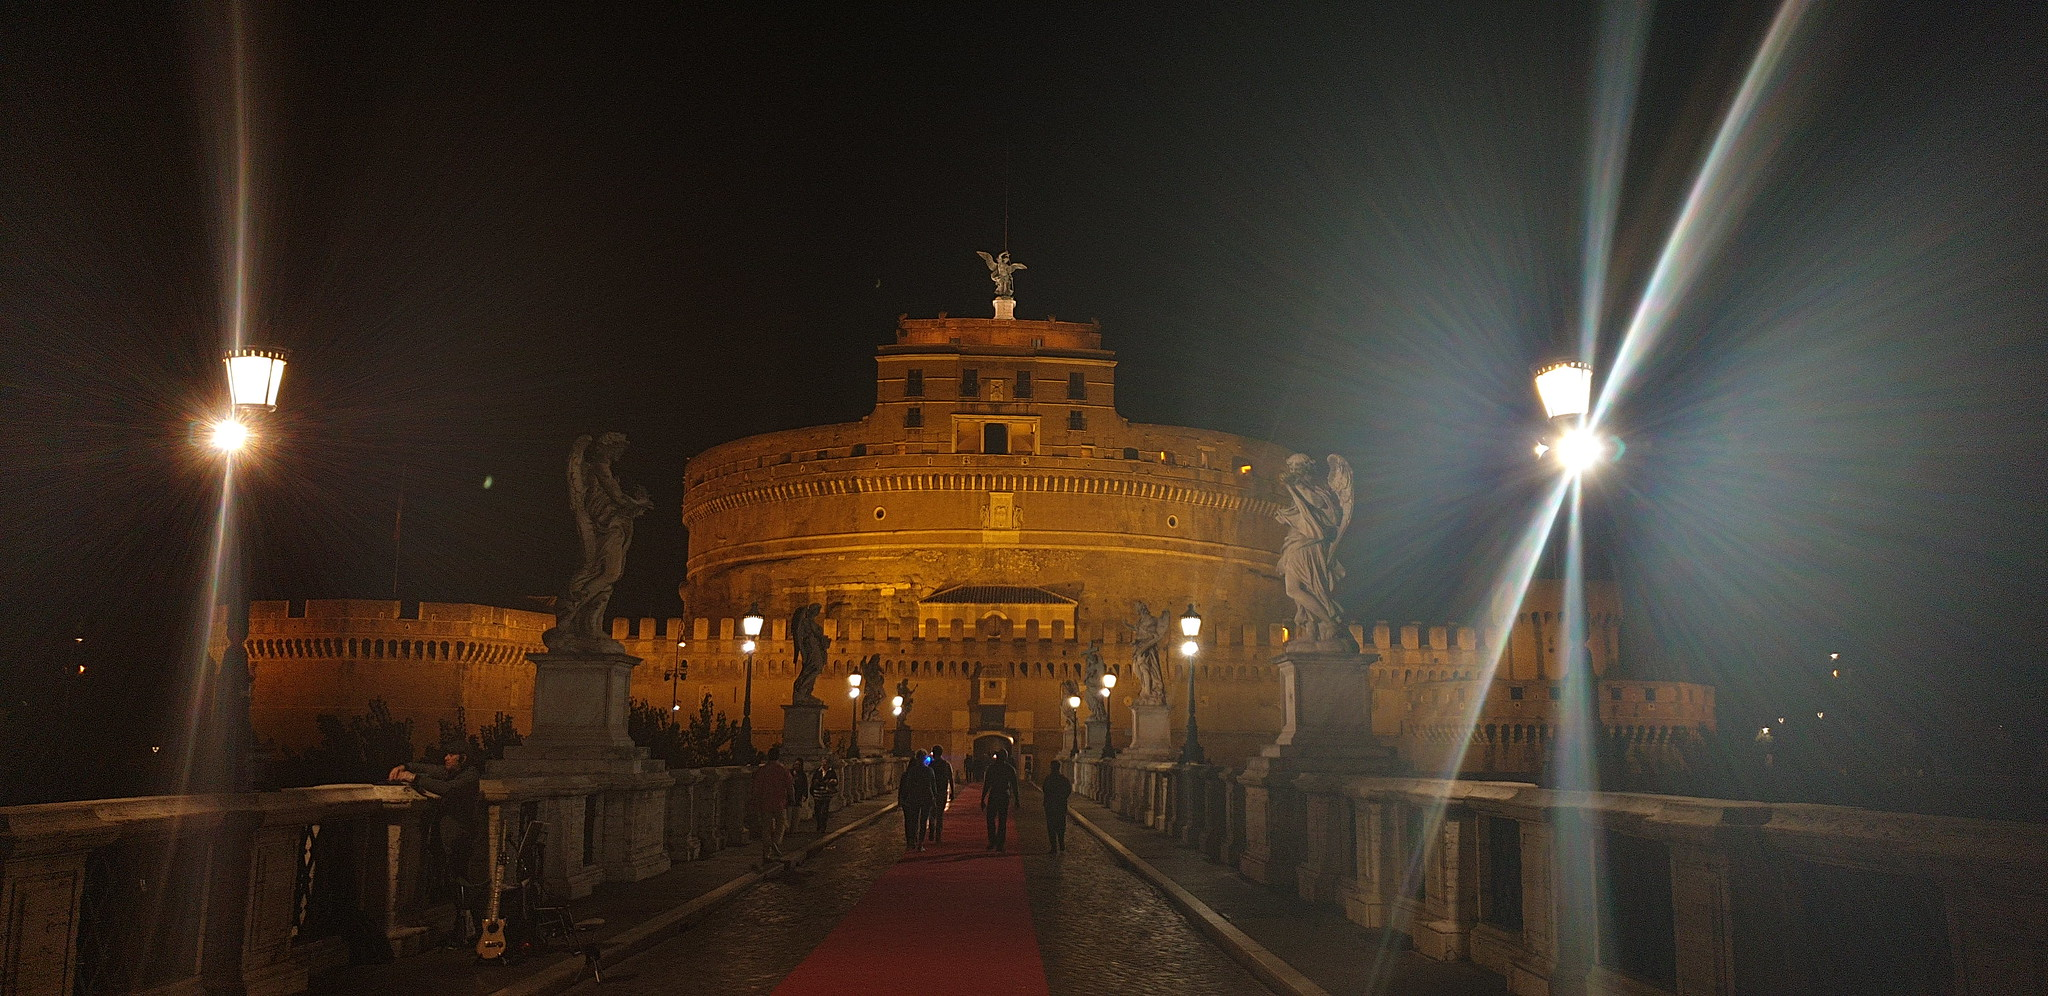 Seminar – The Mausoleum of Hadrian (Castel Sant'Angelo)